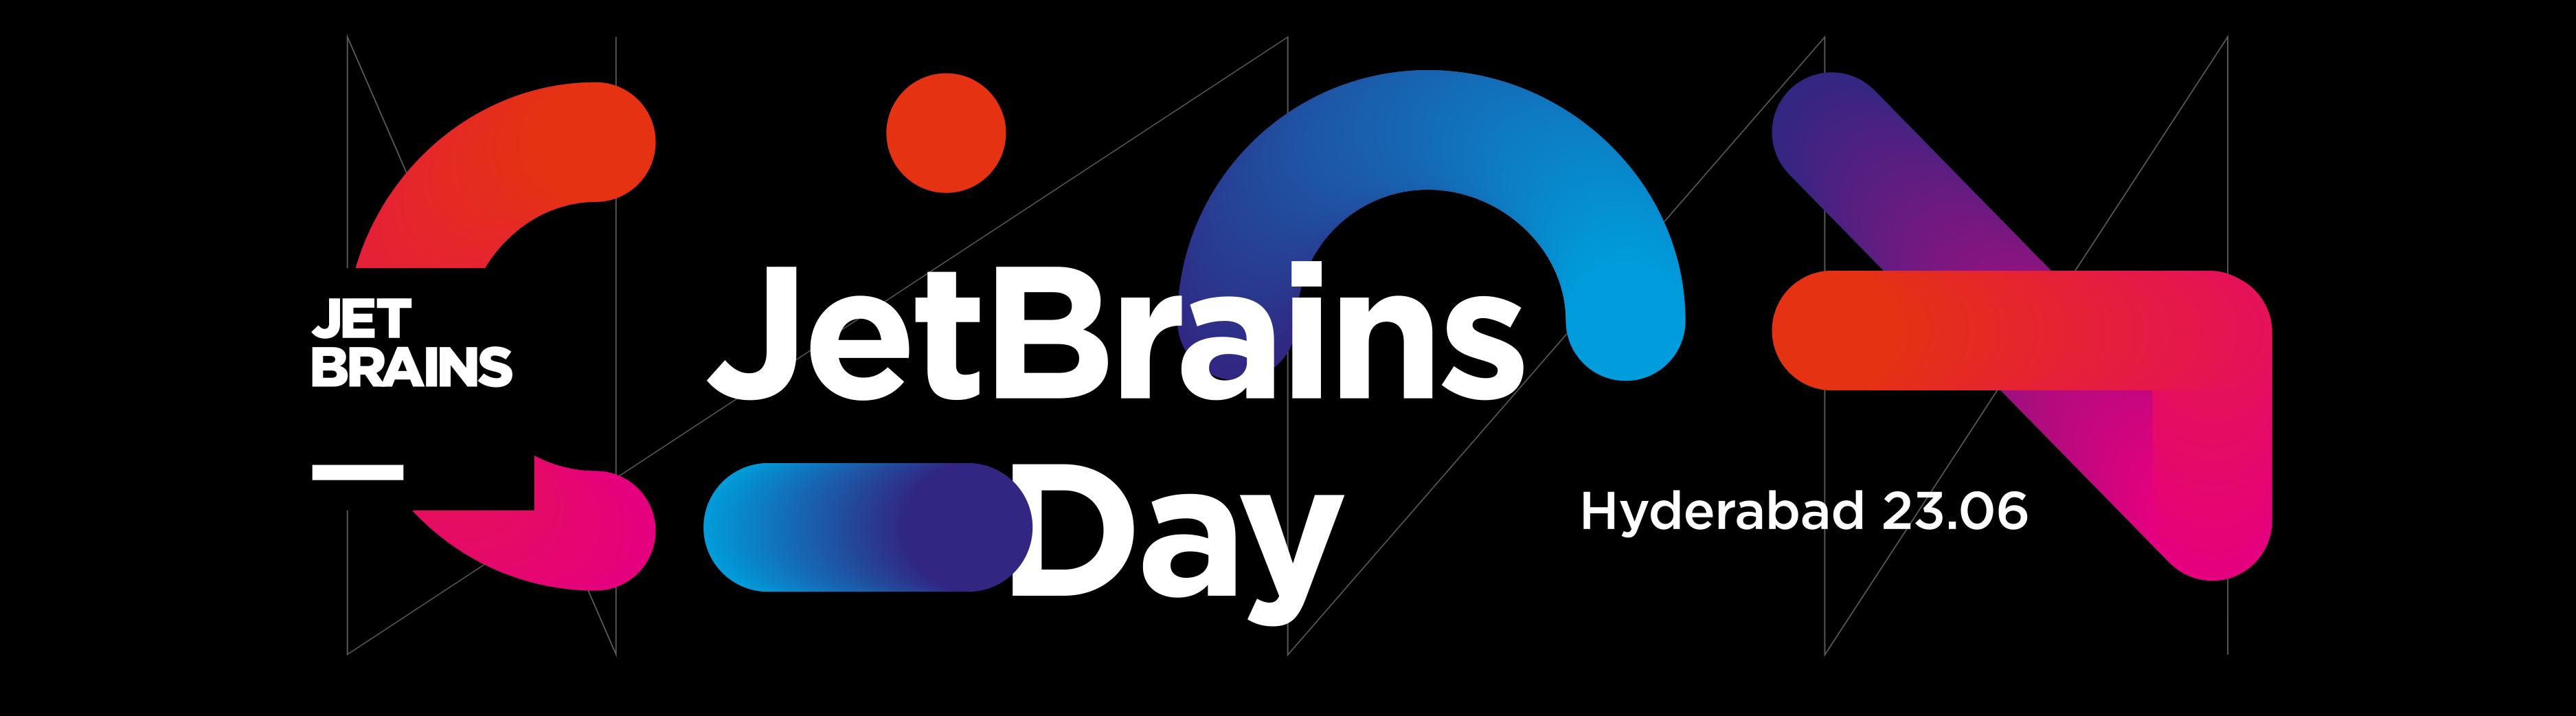 JetBrains Day Hyderabad 2019